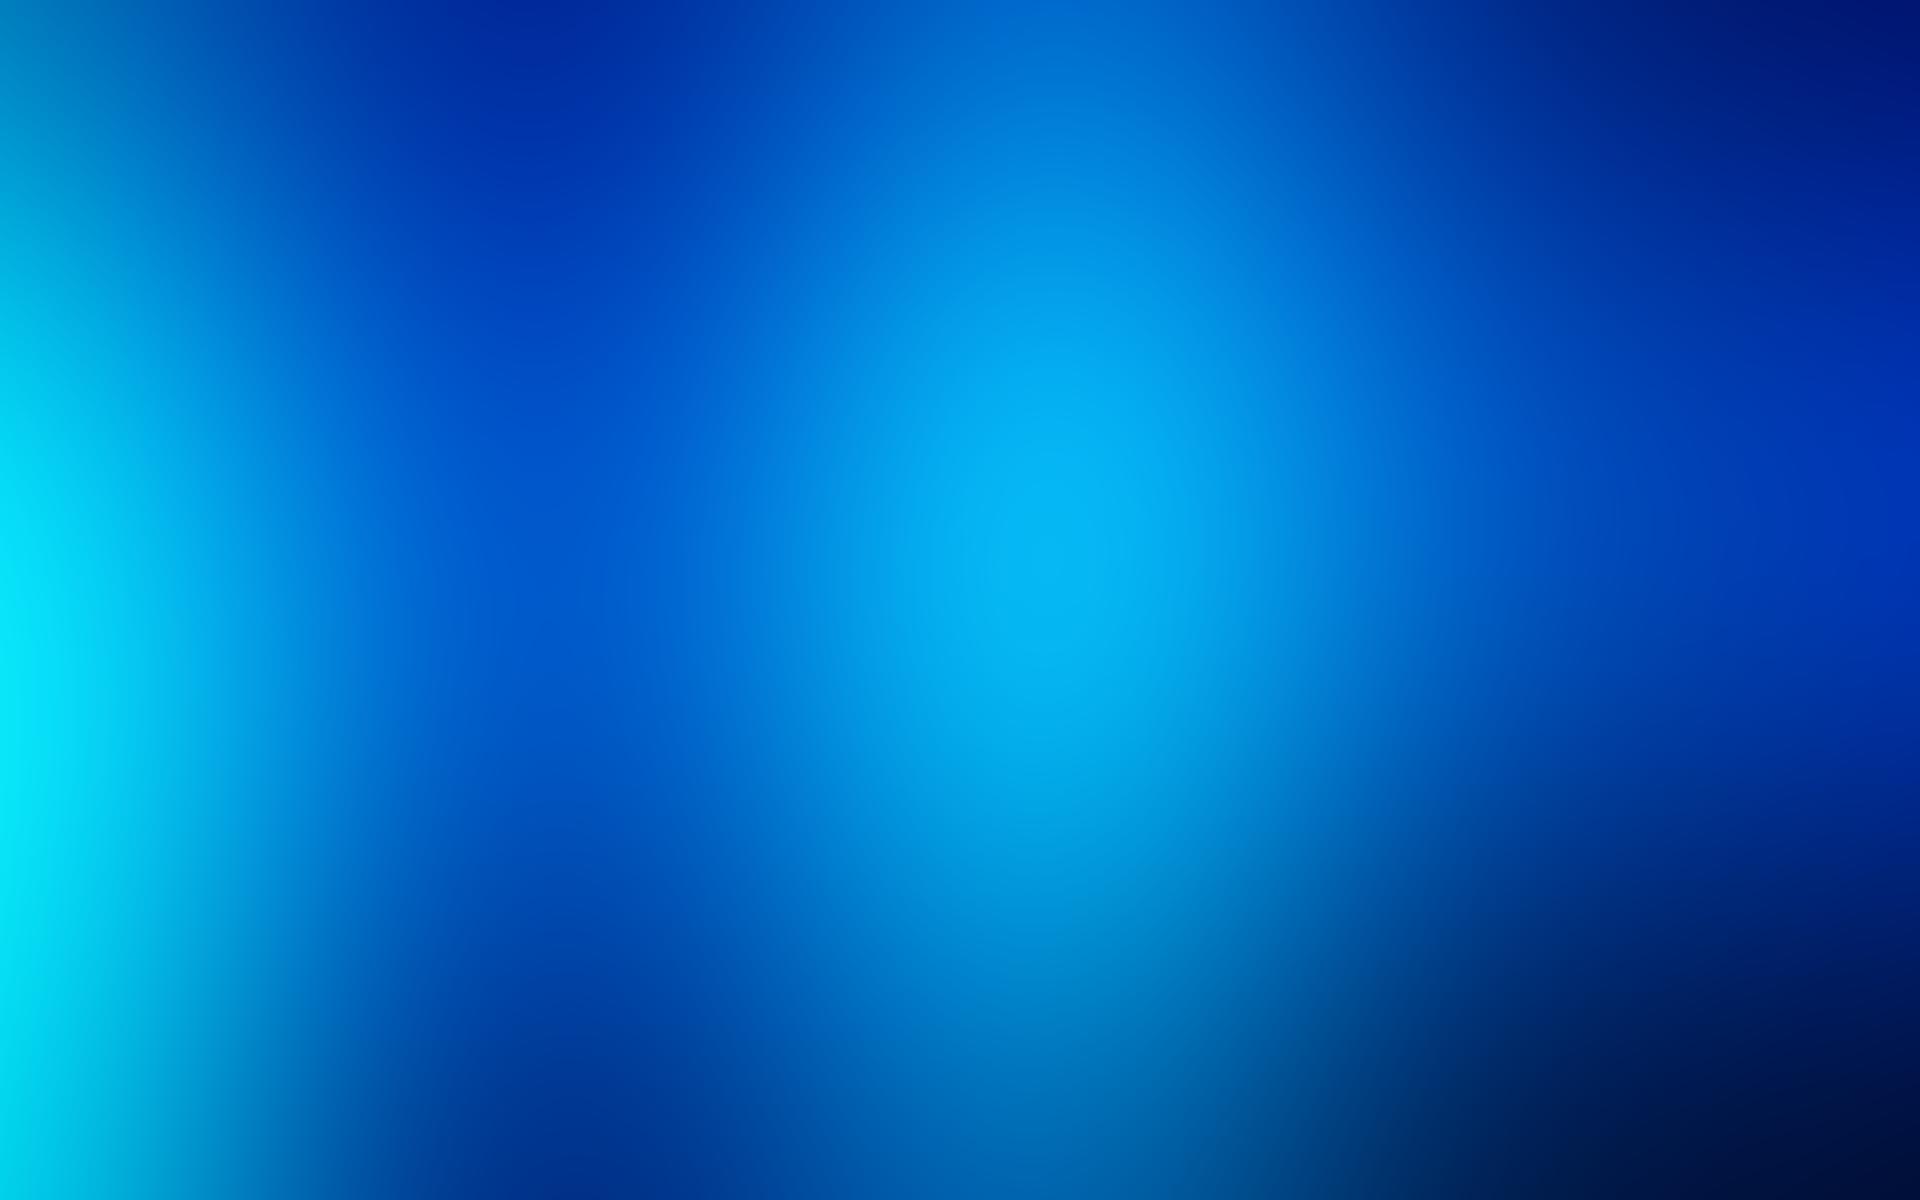 Download Blue Backgrounds Wallpaper 1920x1200 Wallpoper 1920x1200